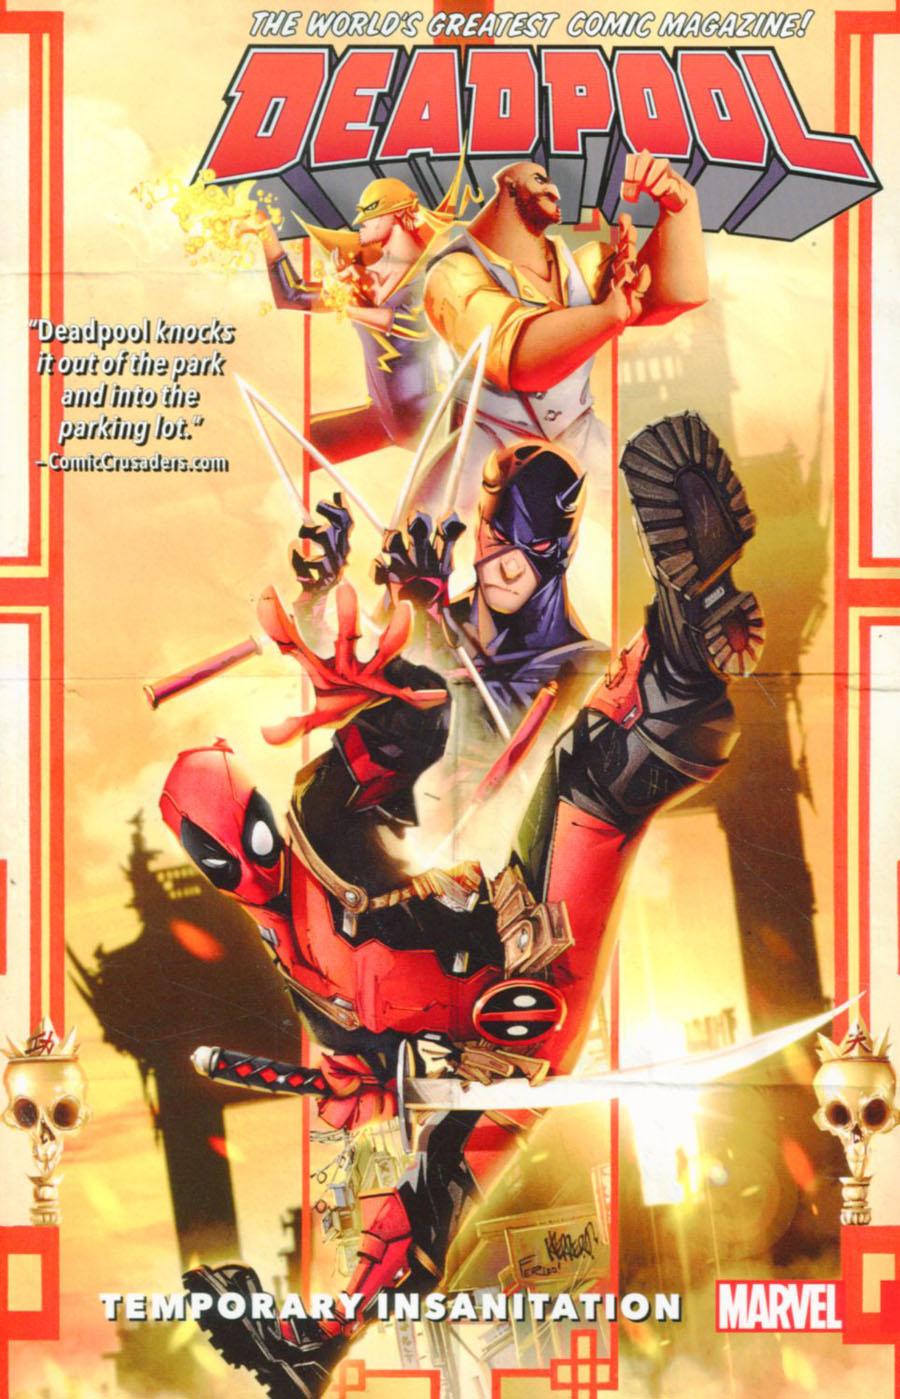 Deadpool Worlds Greatest Vol 4 Temporary Insanitation TP